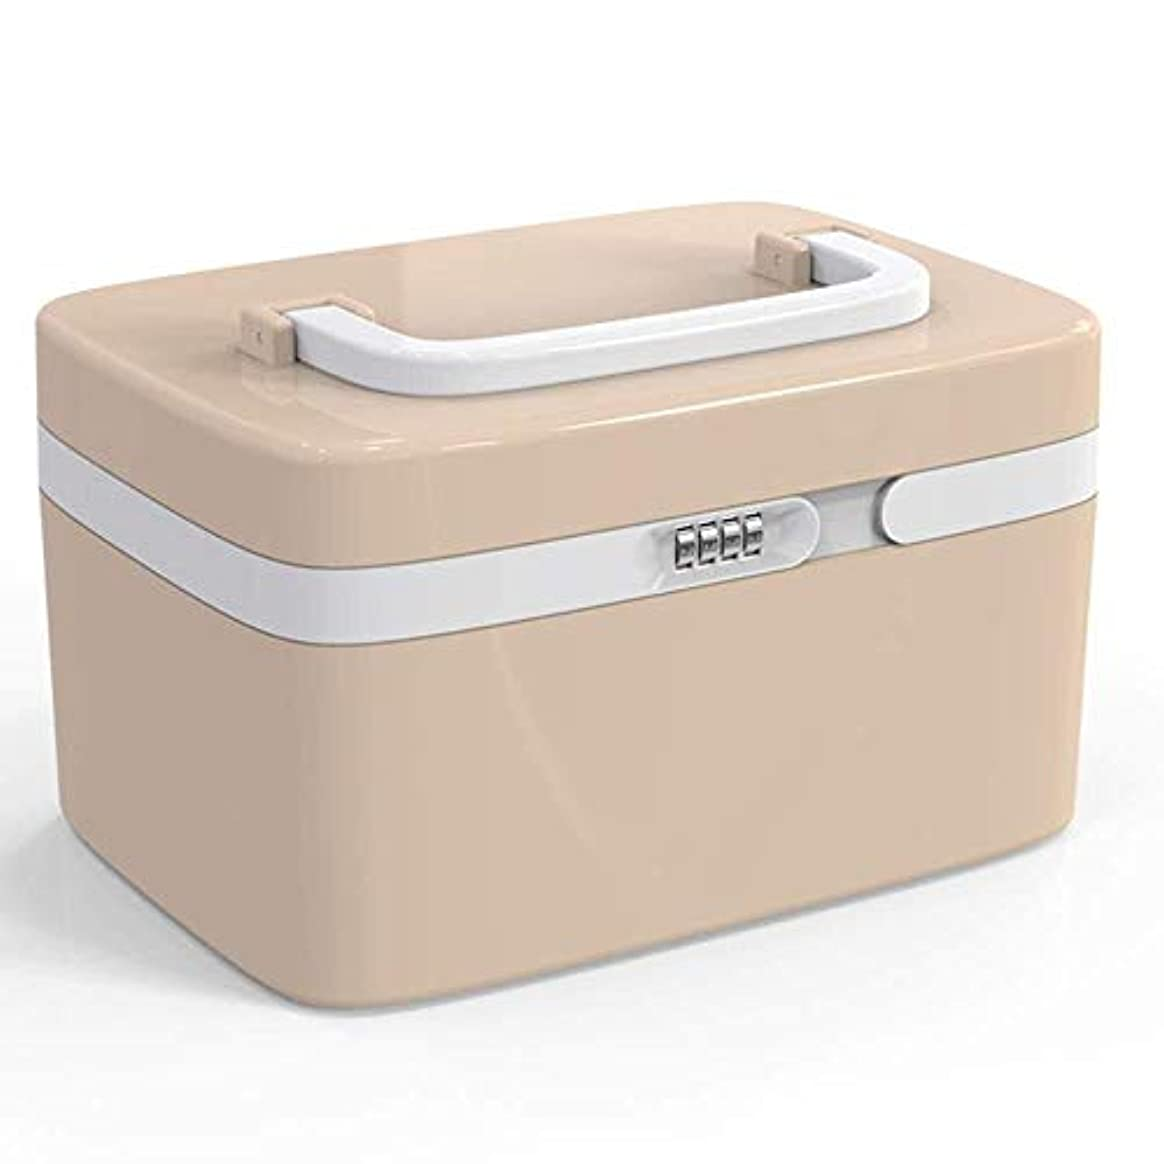 Yxsd 応急処置キット ロックされた在宅医療ボックス健康応急処置キットプラスチック製の小さなパスワード薬箱薬収納ボックス (Color : B)